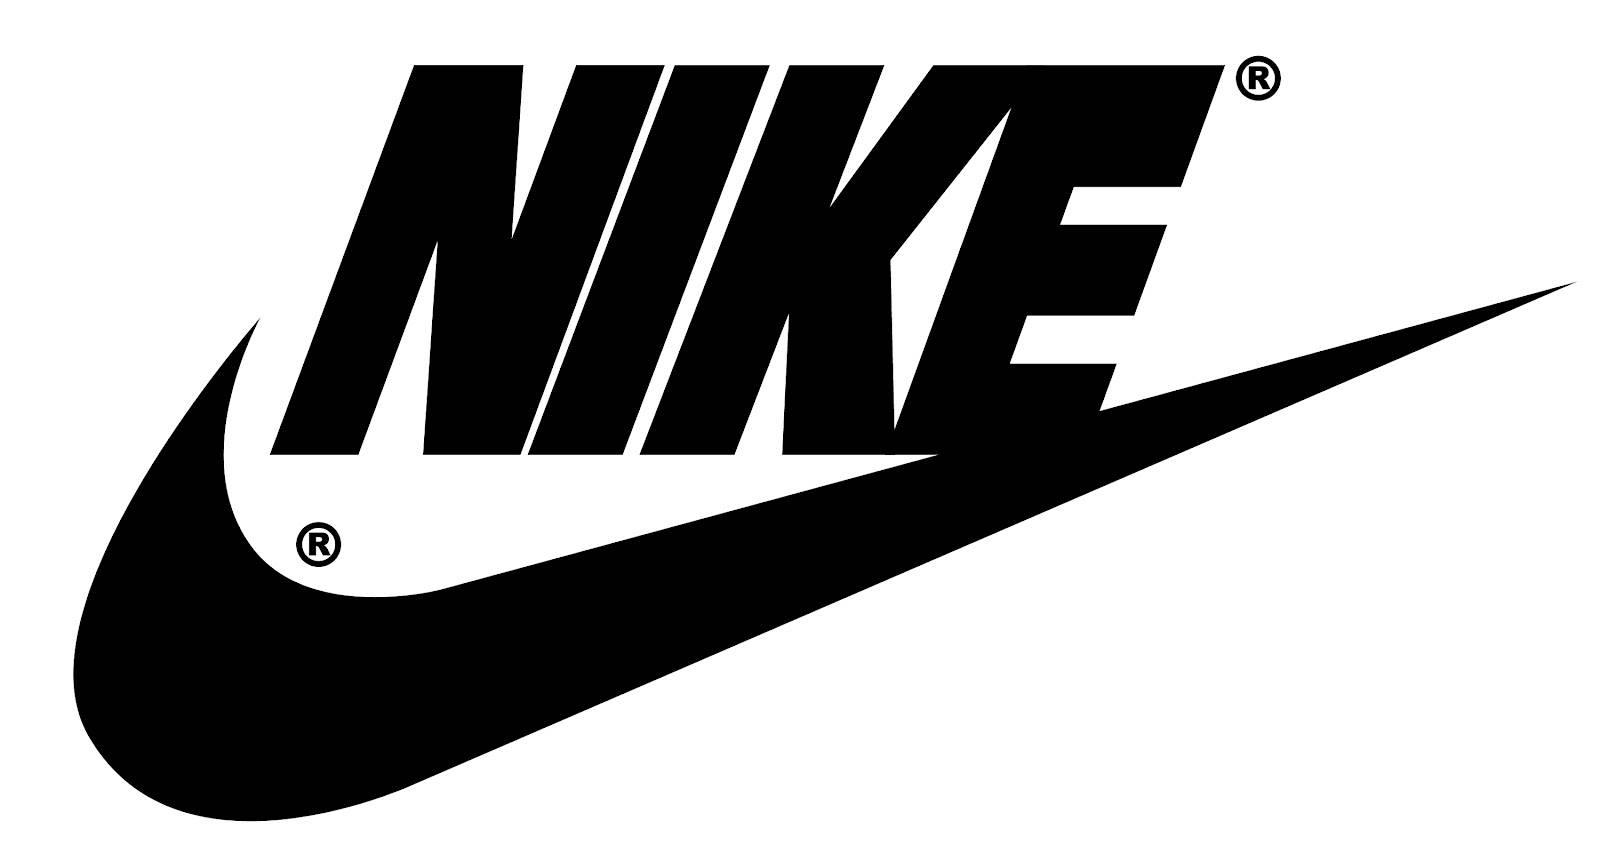 Логотип Nike - Stone Forest